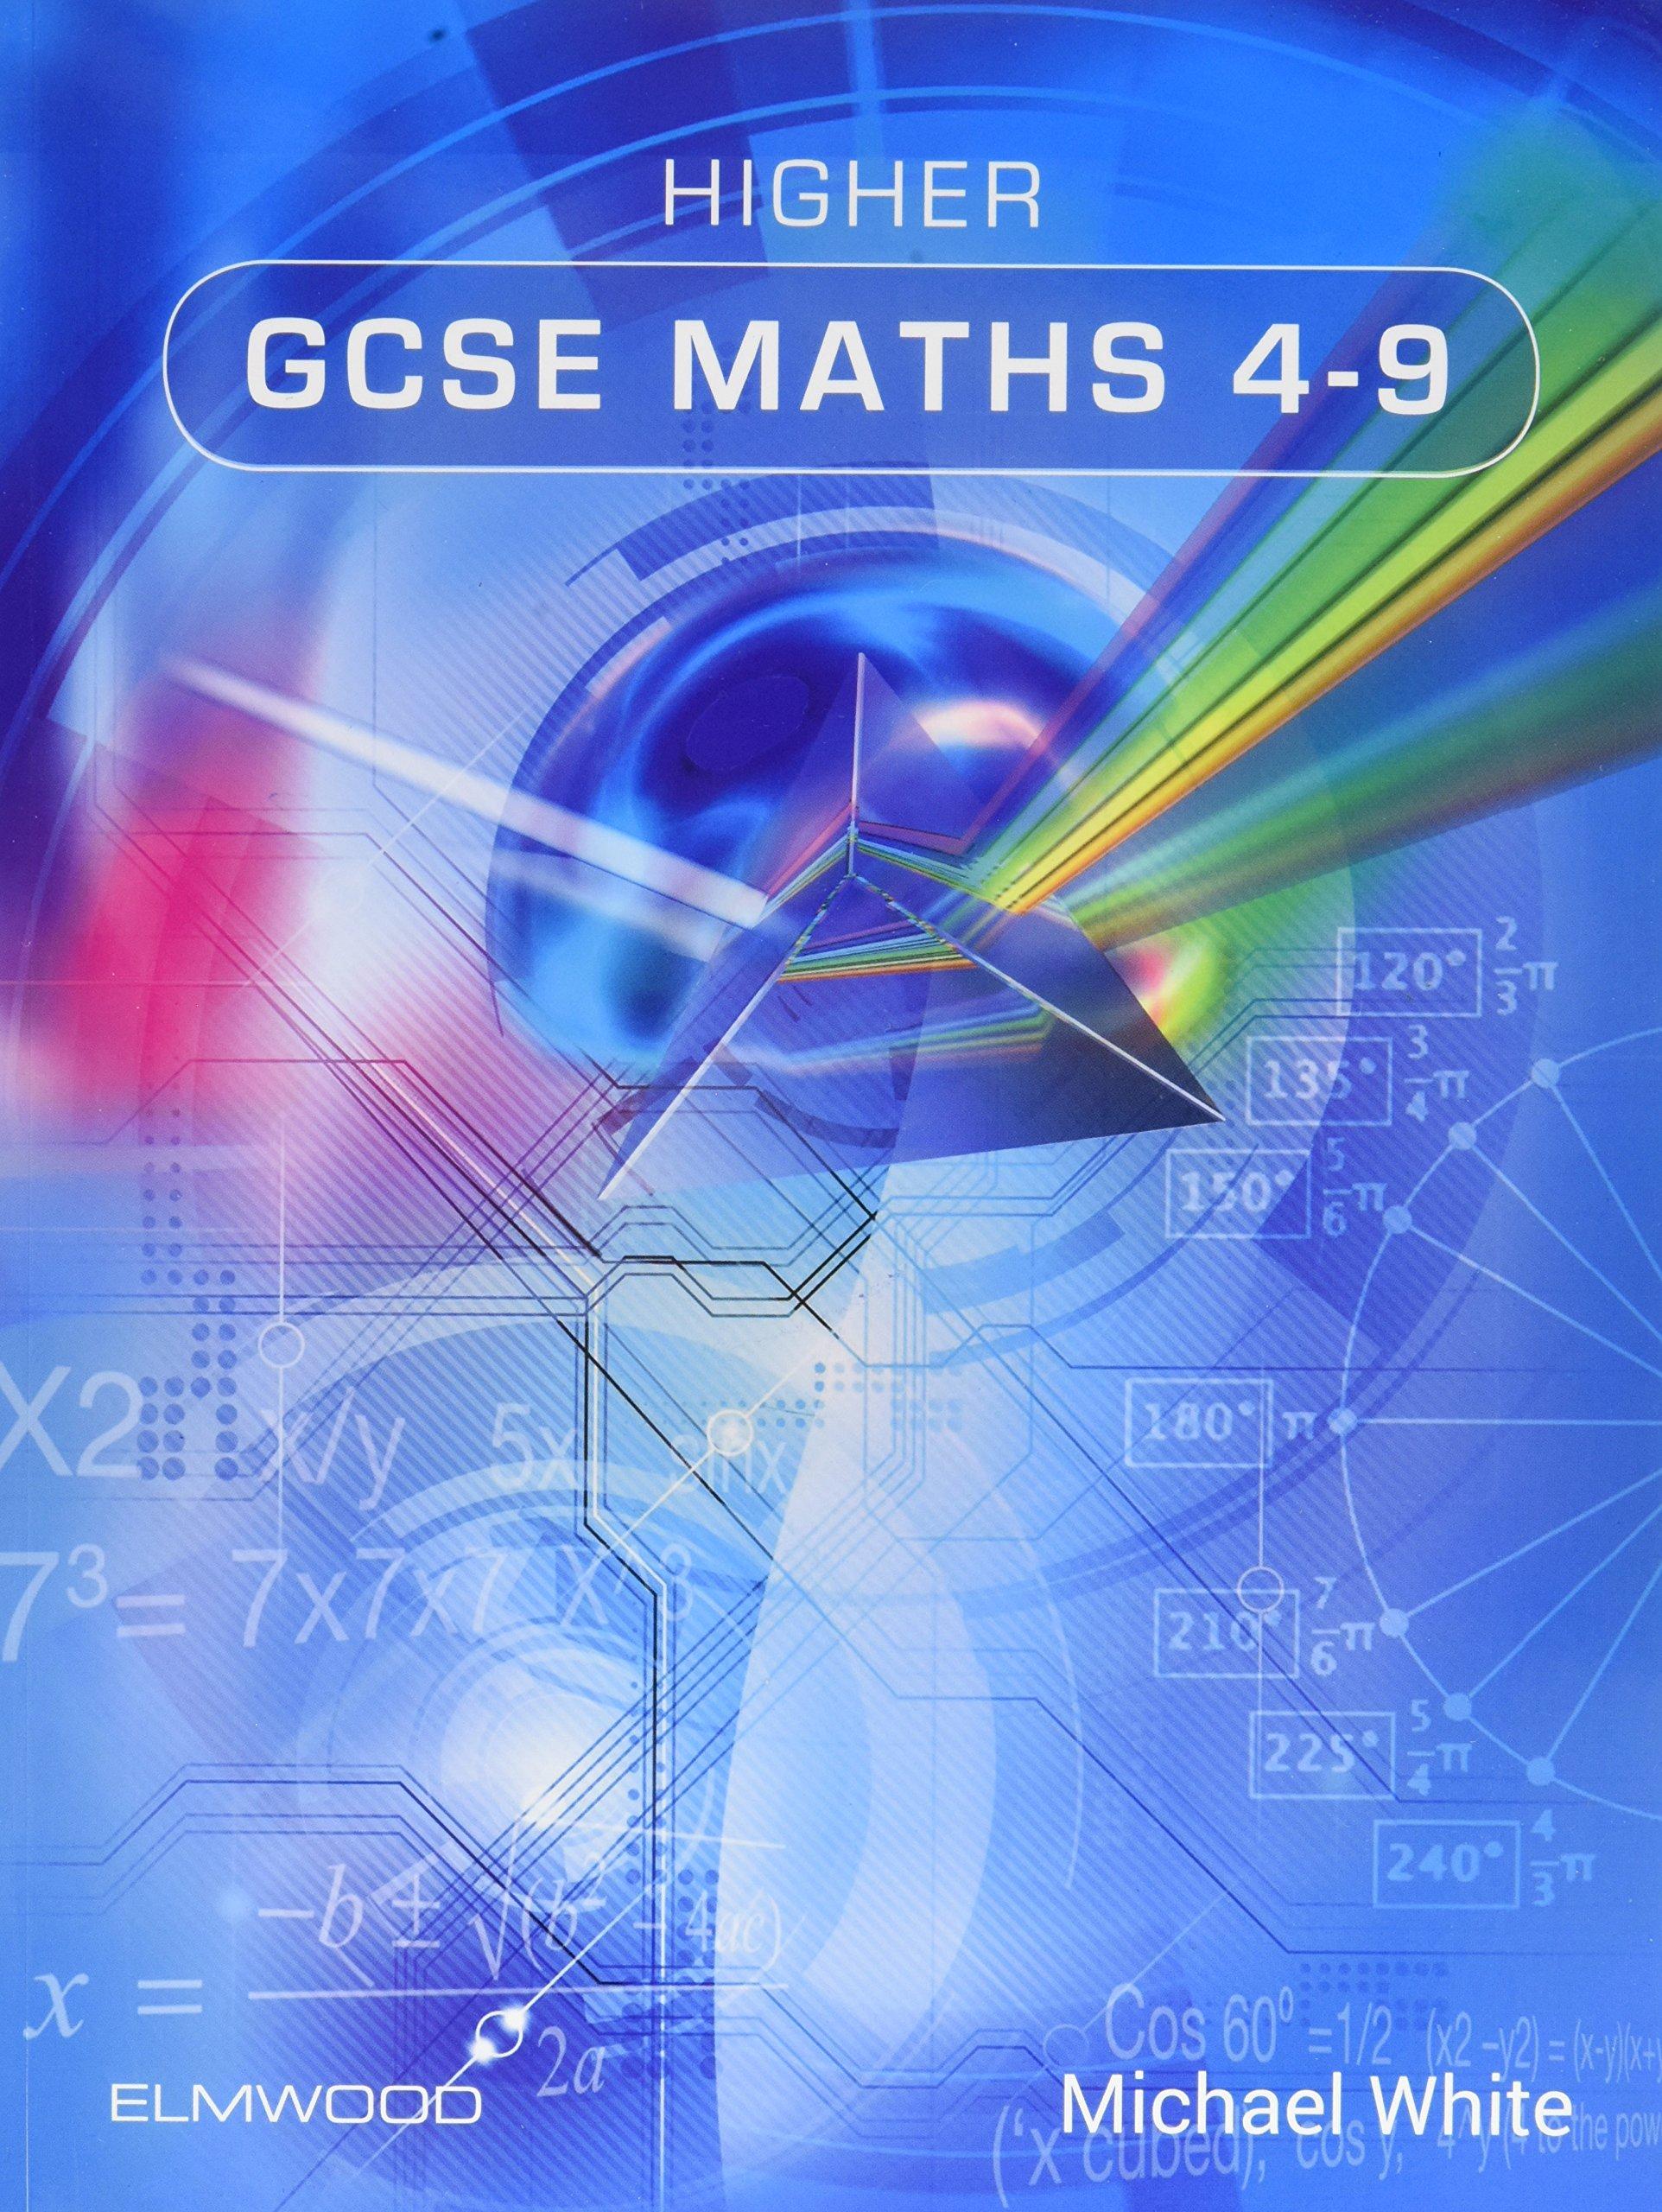 Higher GCSE Maths 4-9: Amazon.co.uk: Michael White: 9781906622510: Books